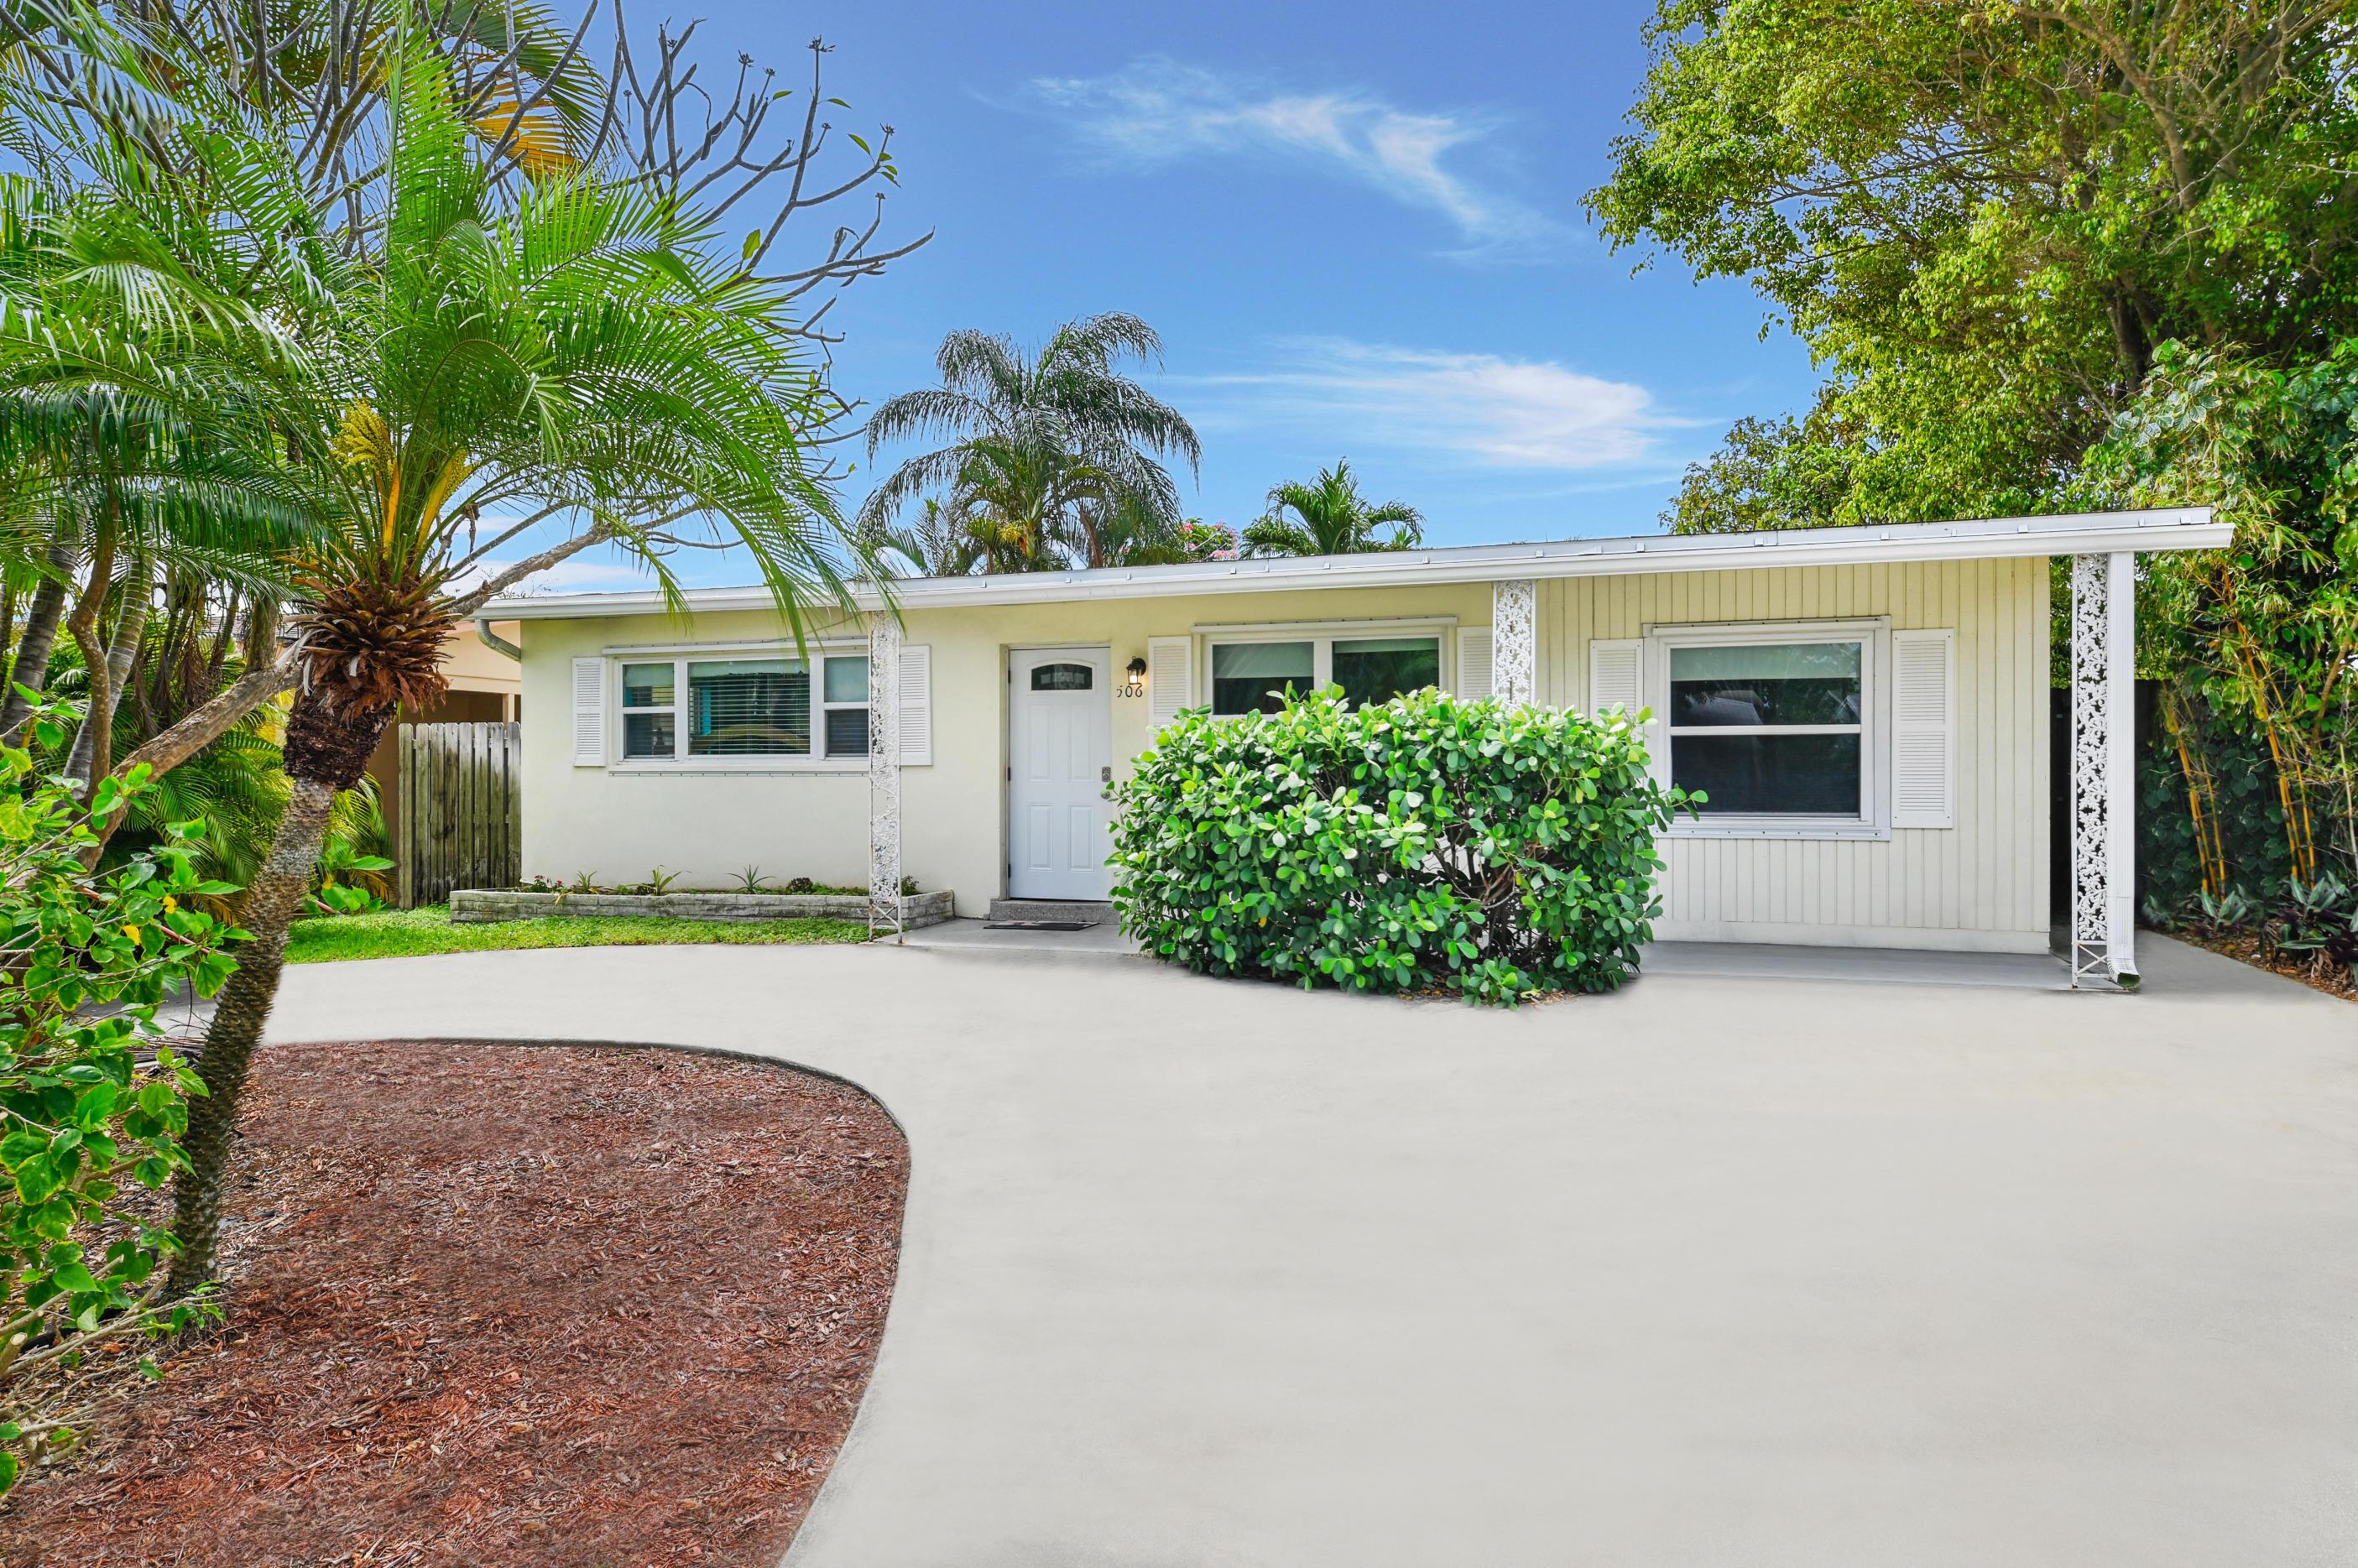 506 Mango Street, Lantana, Florida 33462, 3 Bedrooms Bedrooms, ,1 BathroomBathrooms,A,Single family,Mango,RX-10614746